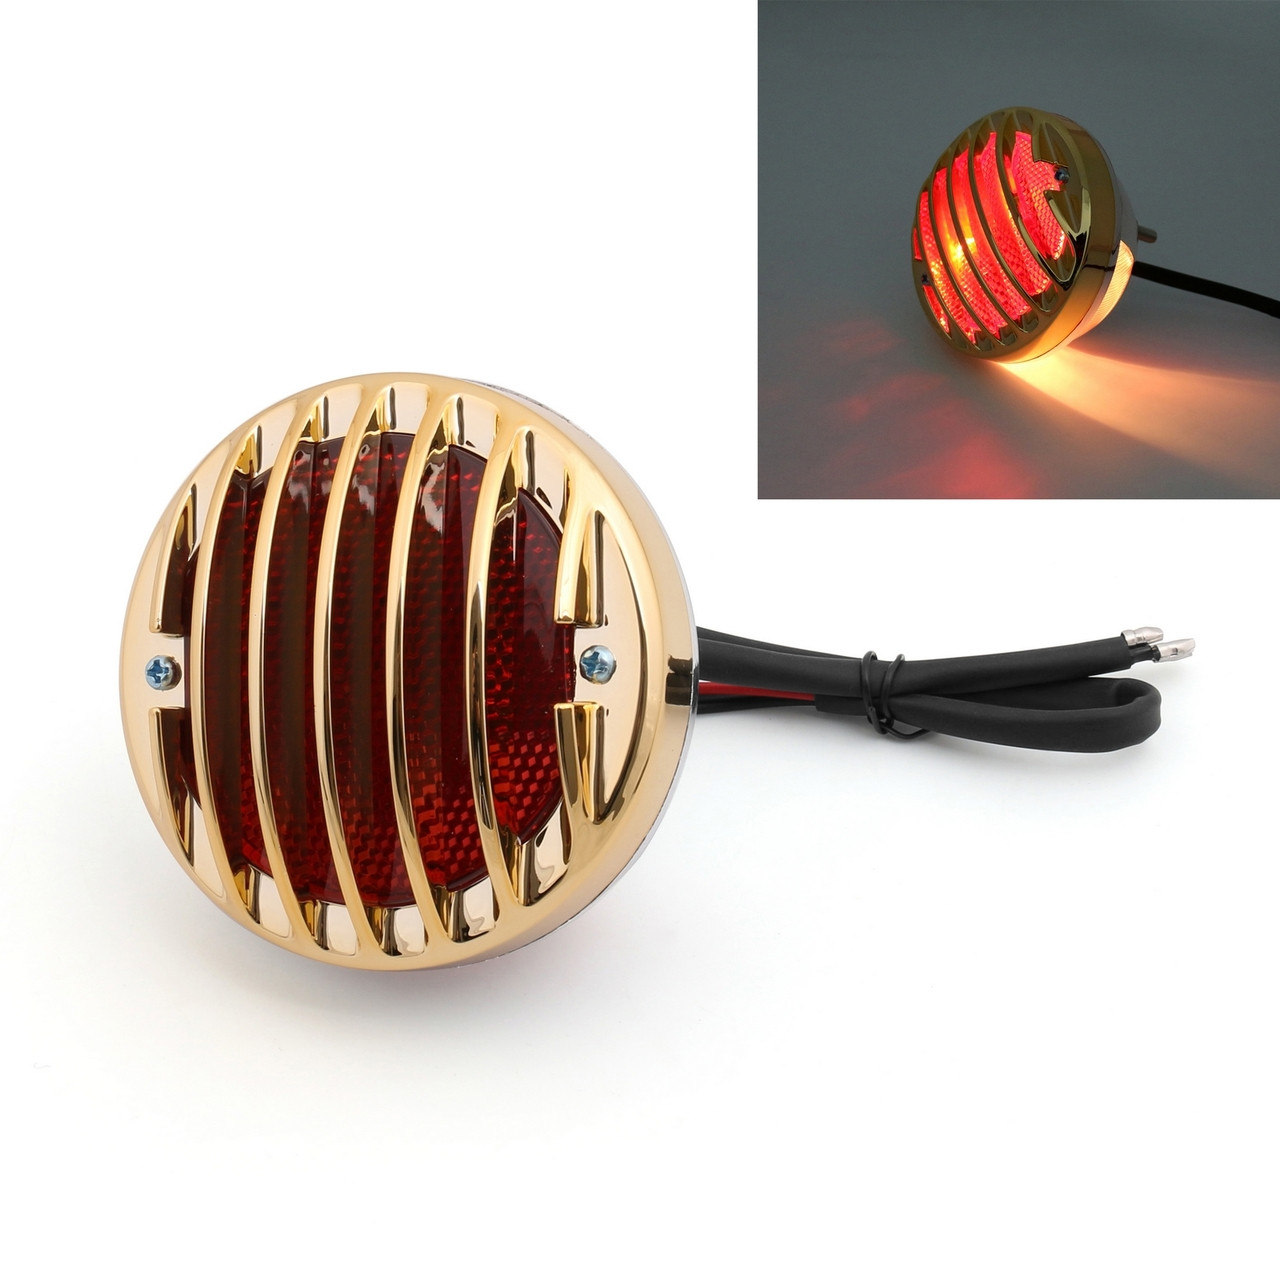 http://www.madhornets.store/AMZ/MotoPart/Taillight/TL-301/TL-301-Gold-1.jpg